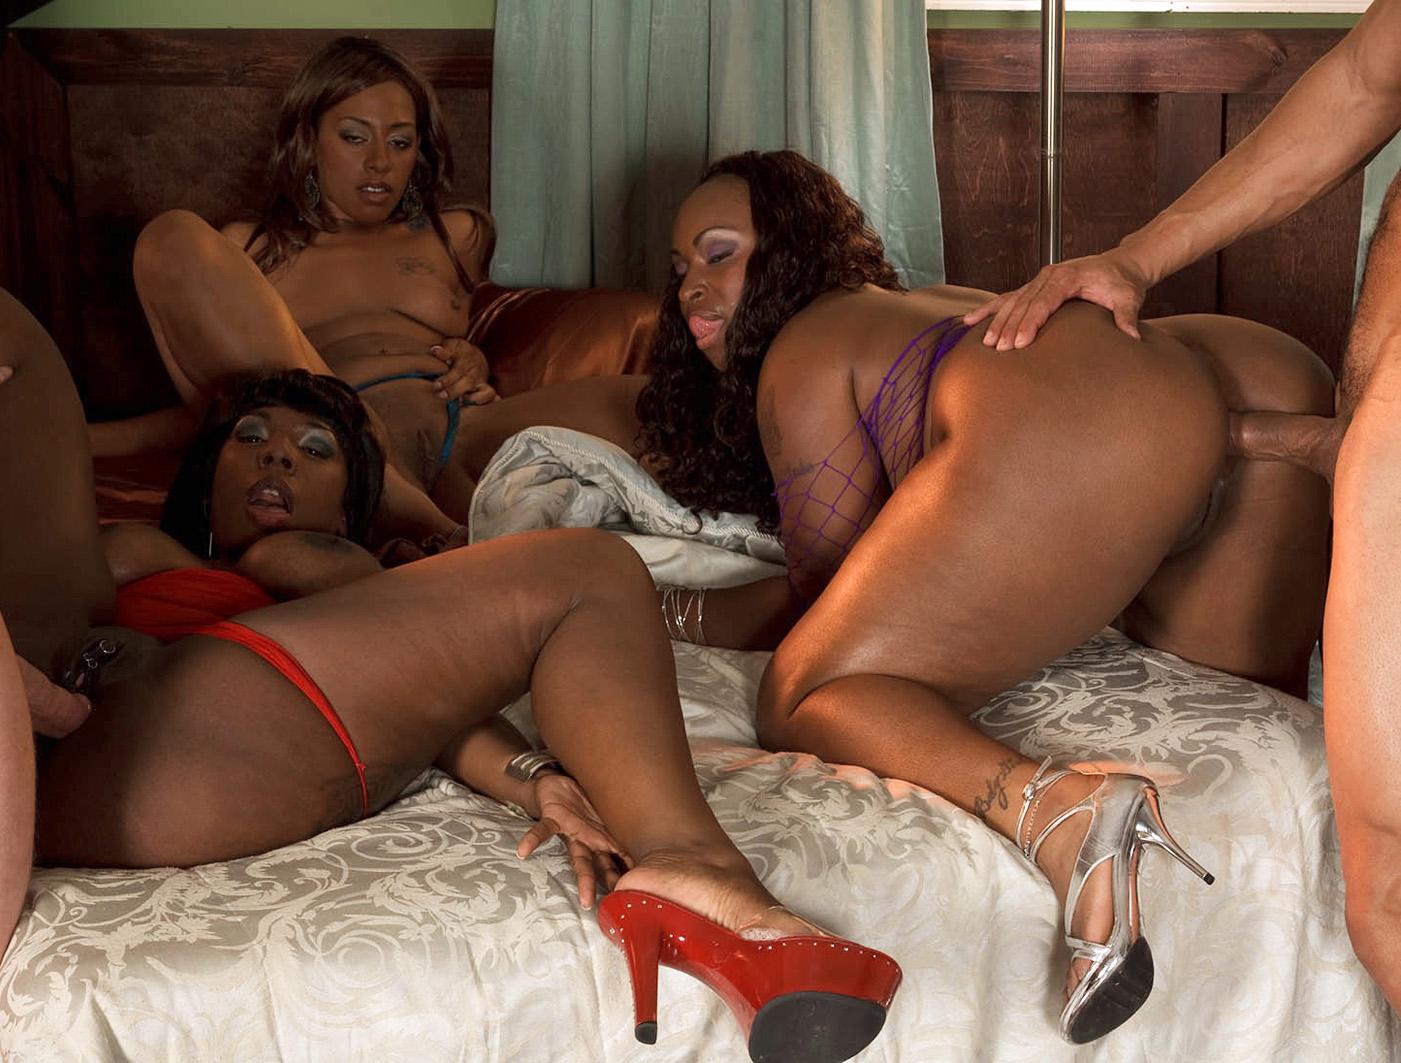 Ebony porn photos. Gallery № 37. Photo - 10